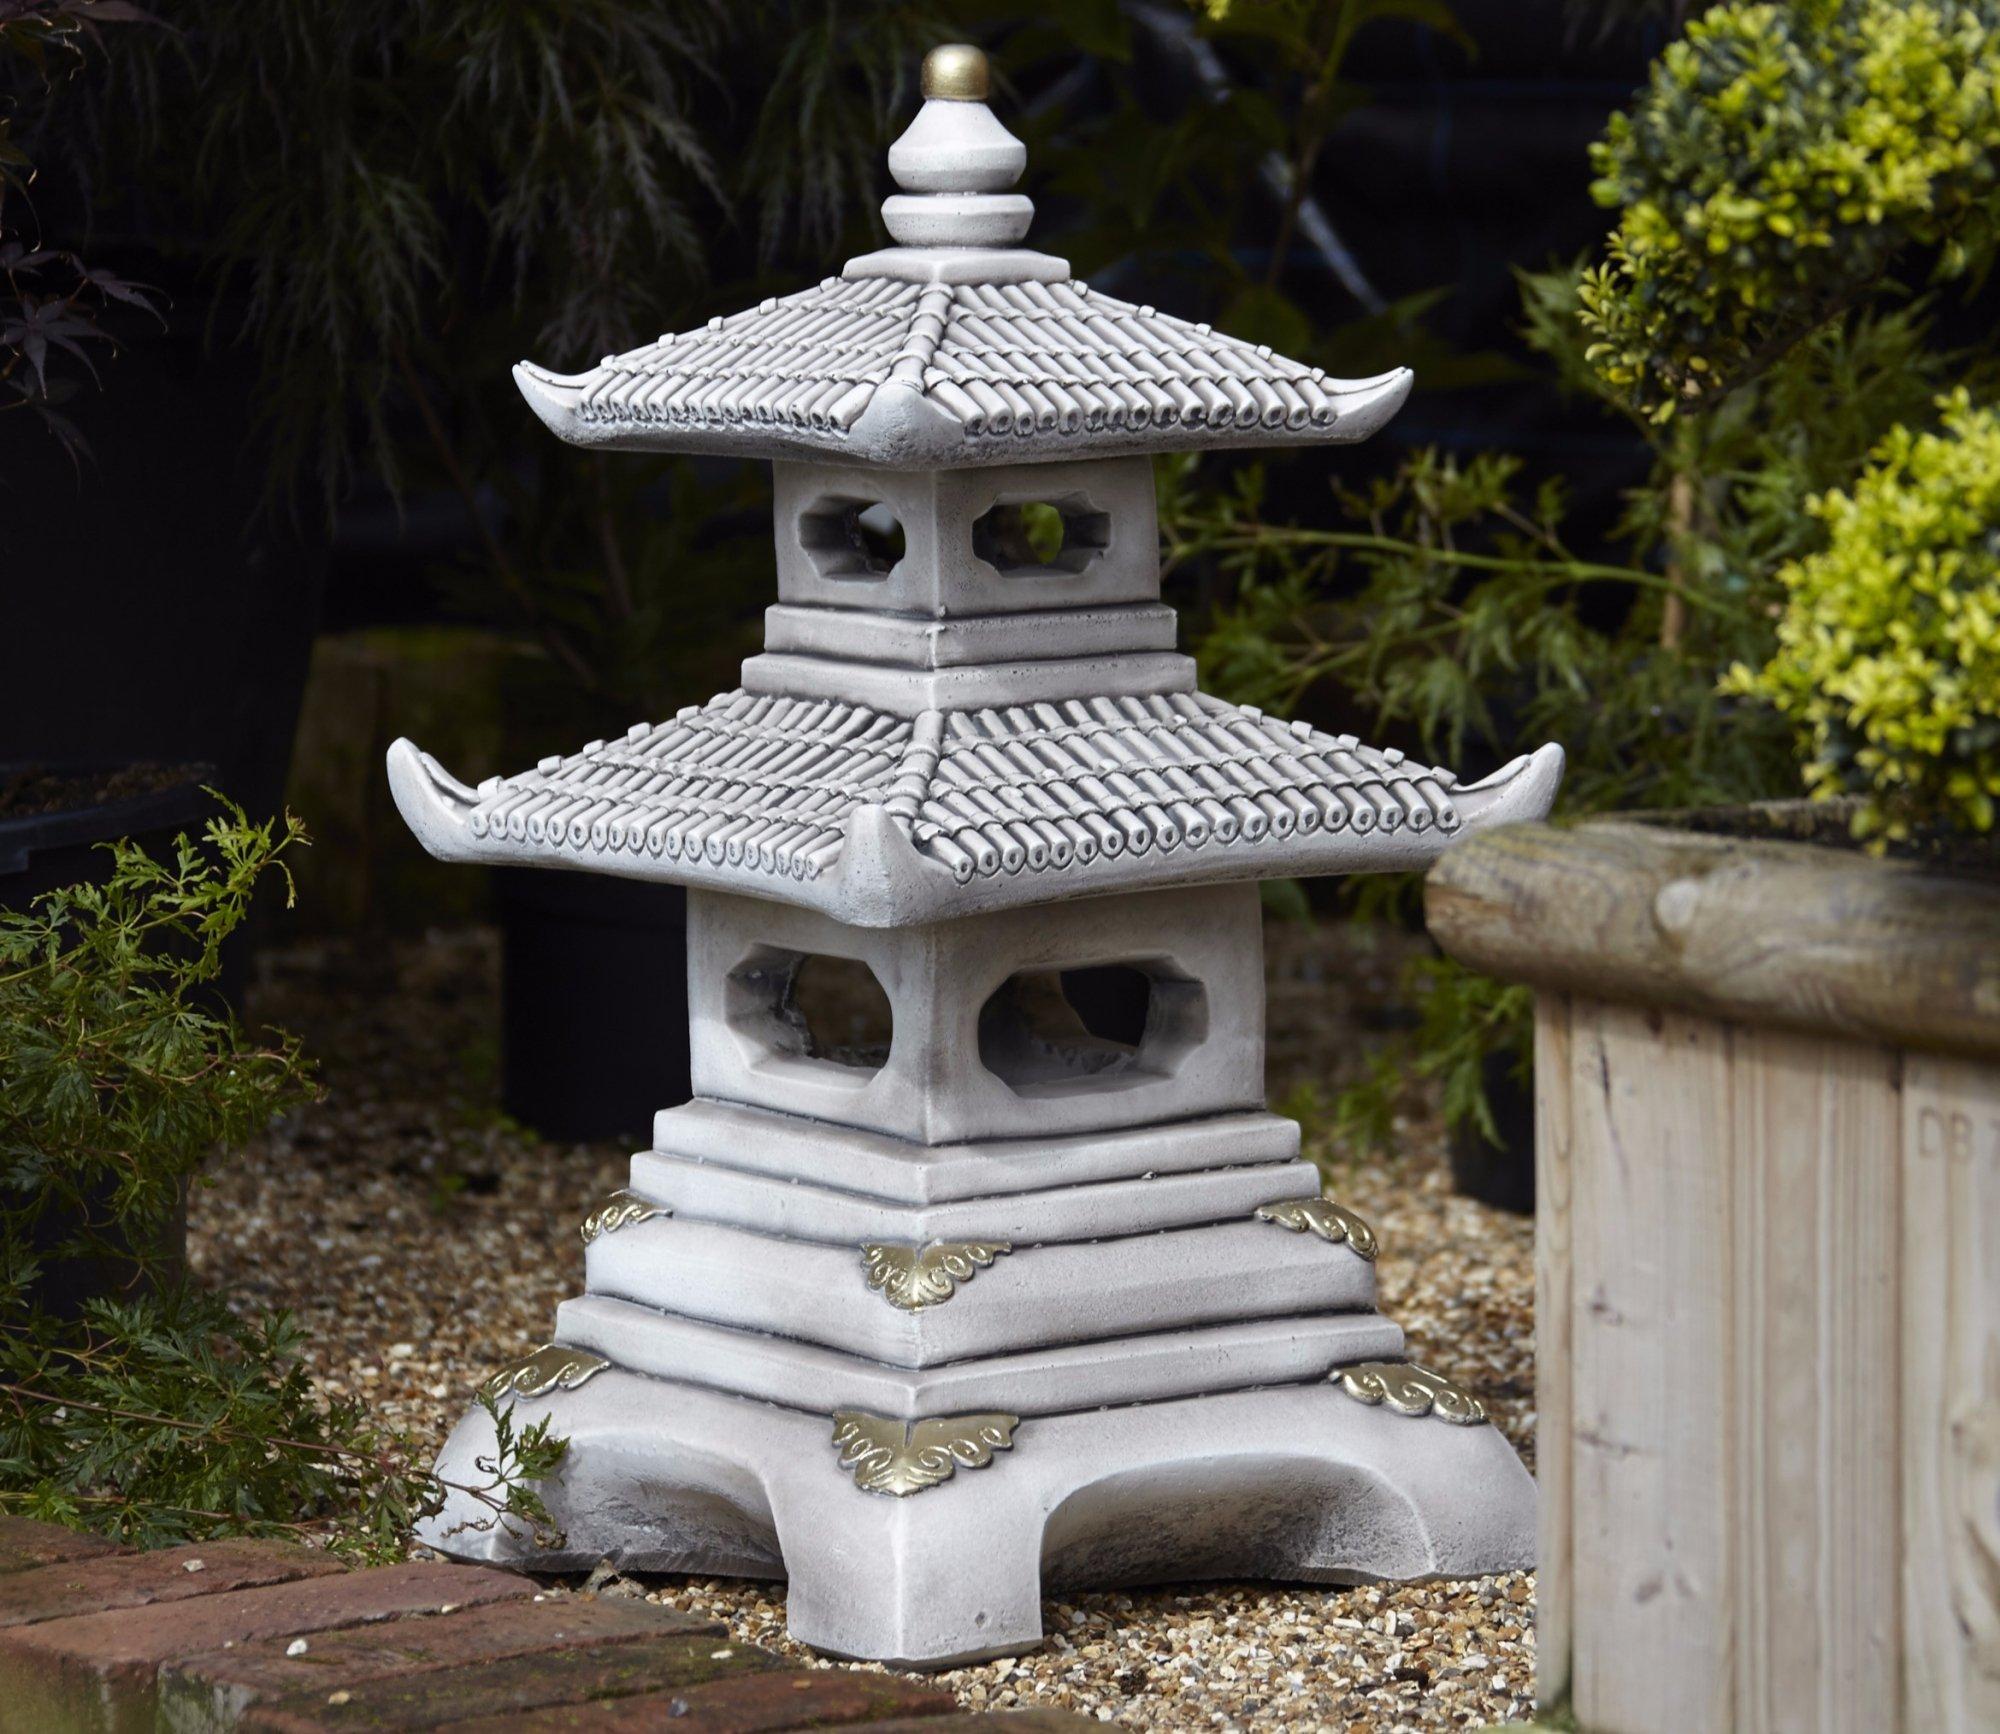 garden ornaments borderstone two tier pagoda garden ornament WJMEZBR